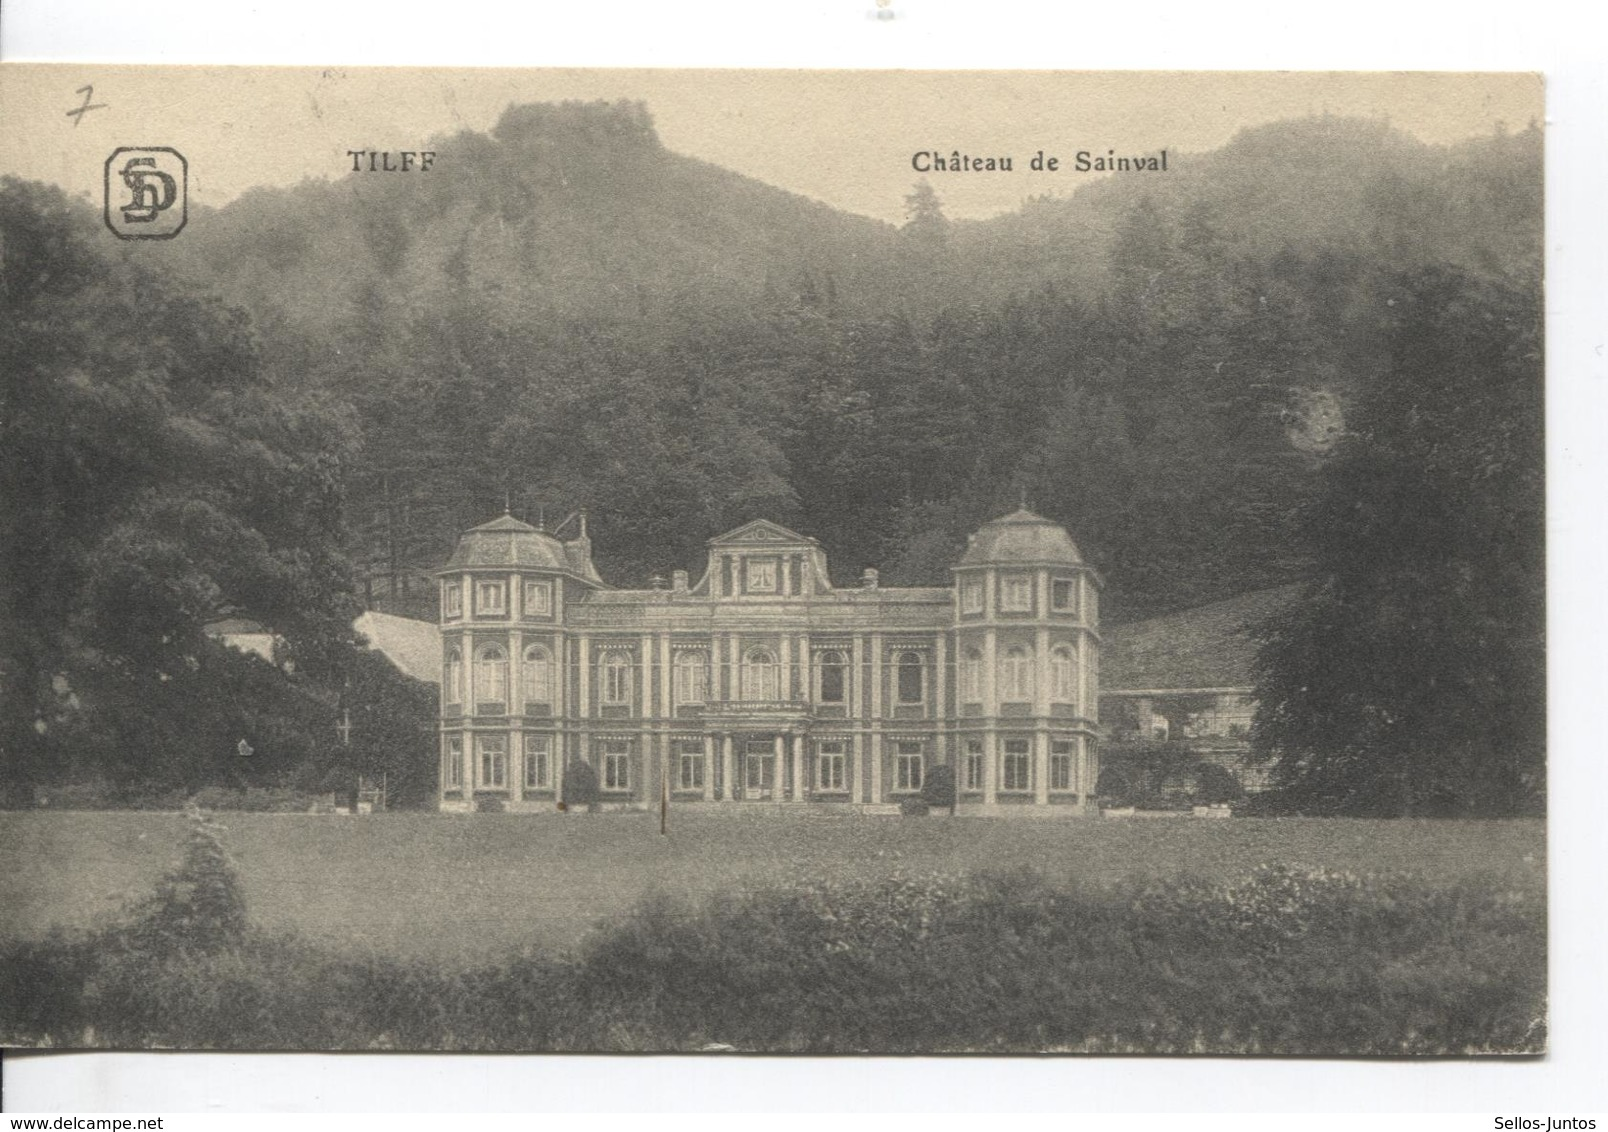 SJ87/ TP Oc 14 S/CP Château De Sainval (Tilff) C.Tilff 1916 Censure Lüttich V.Berlin - WW I